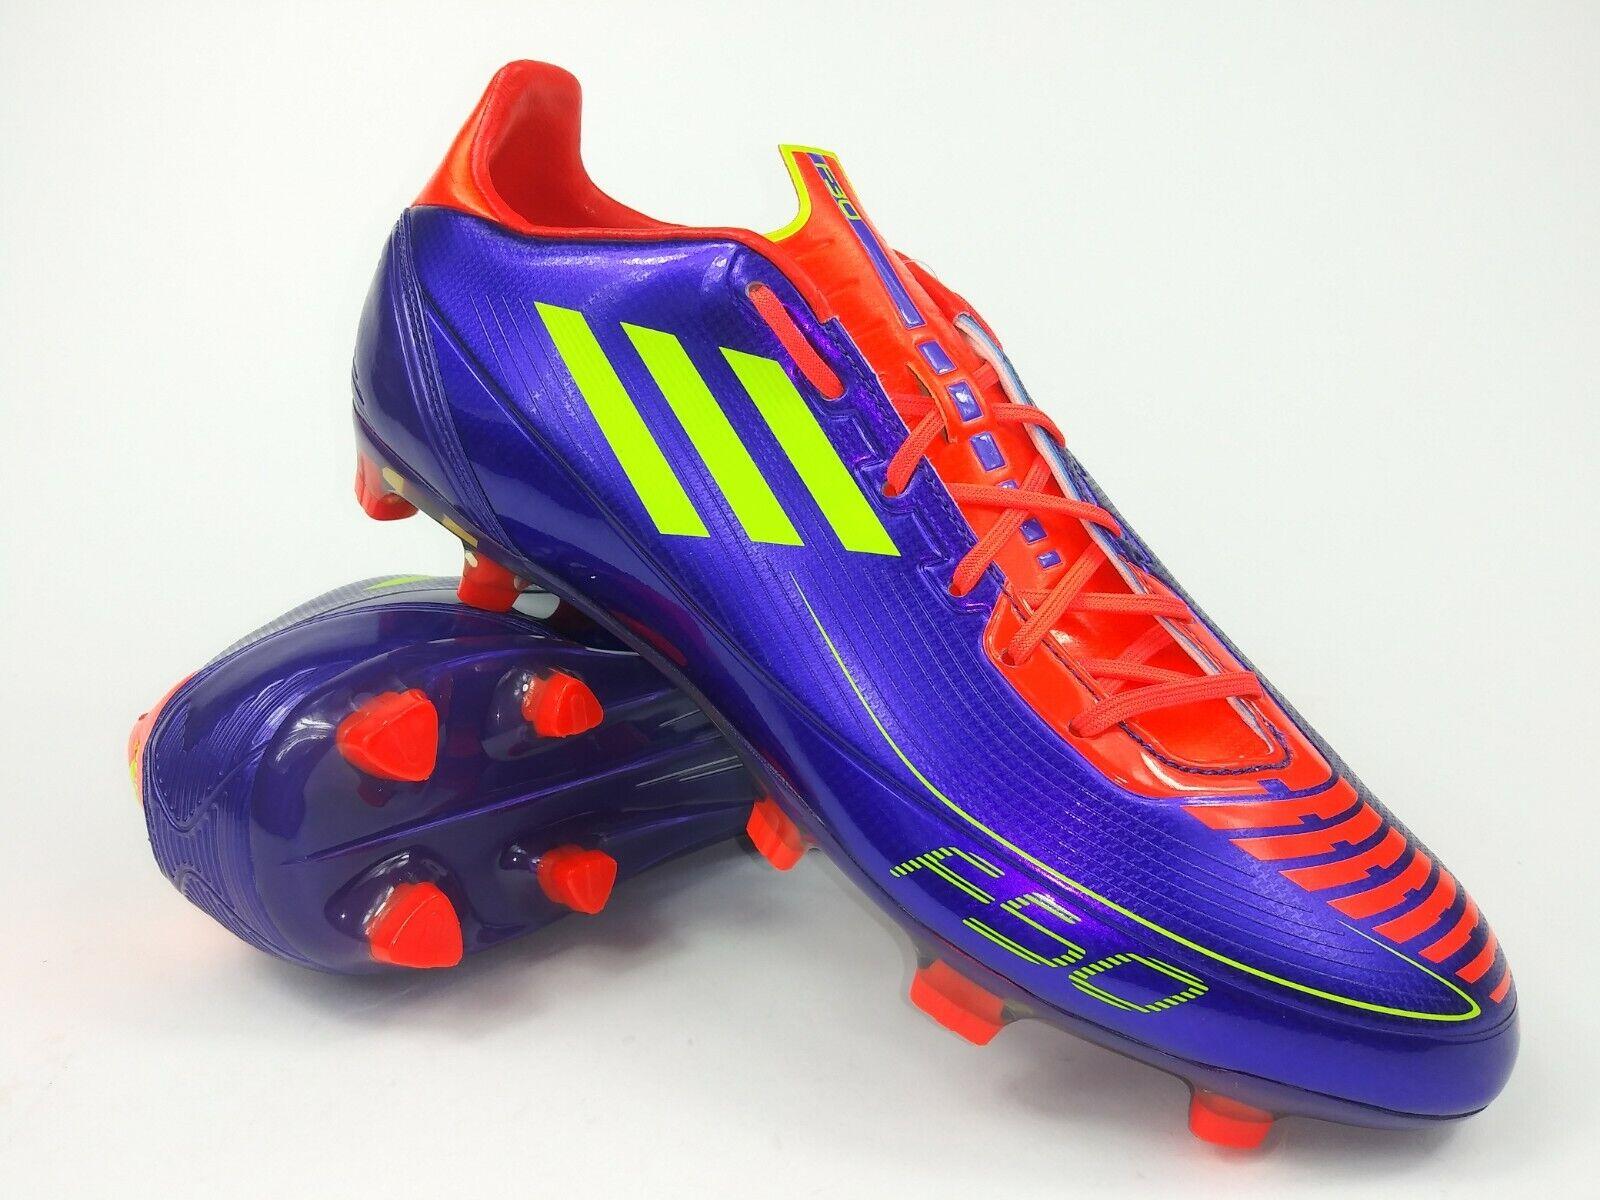 adidas cleats purple